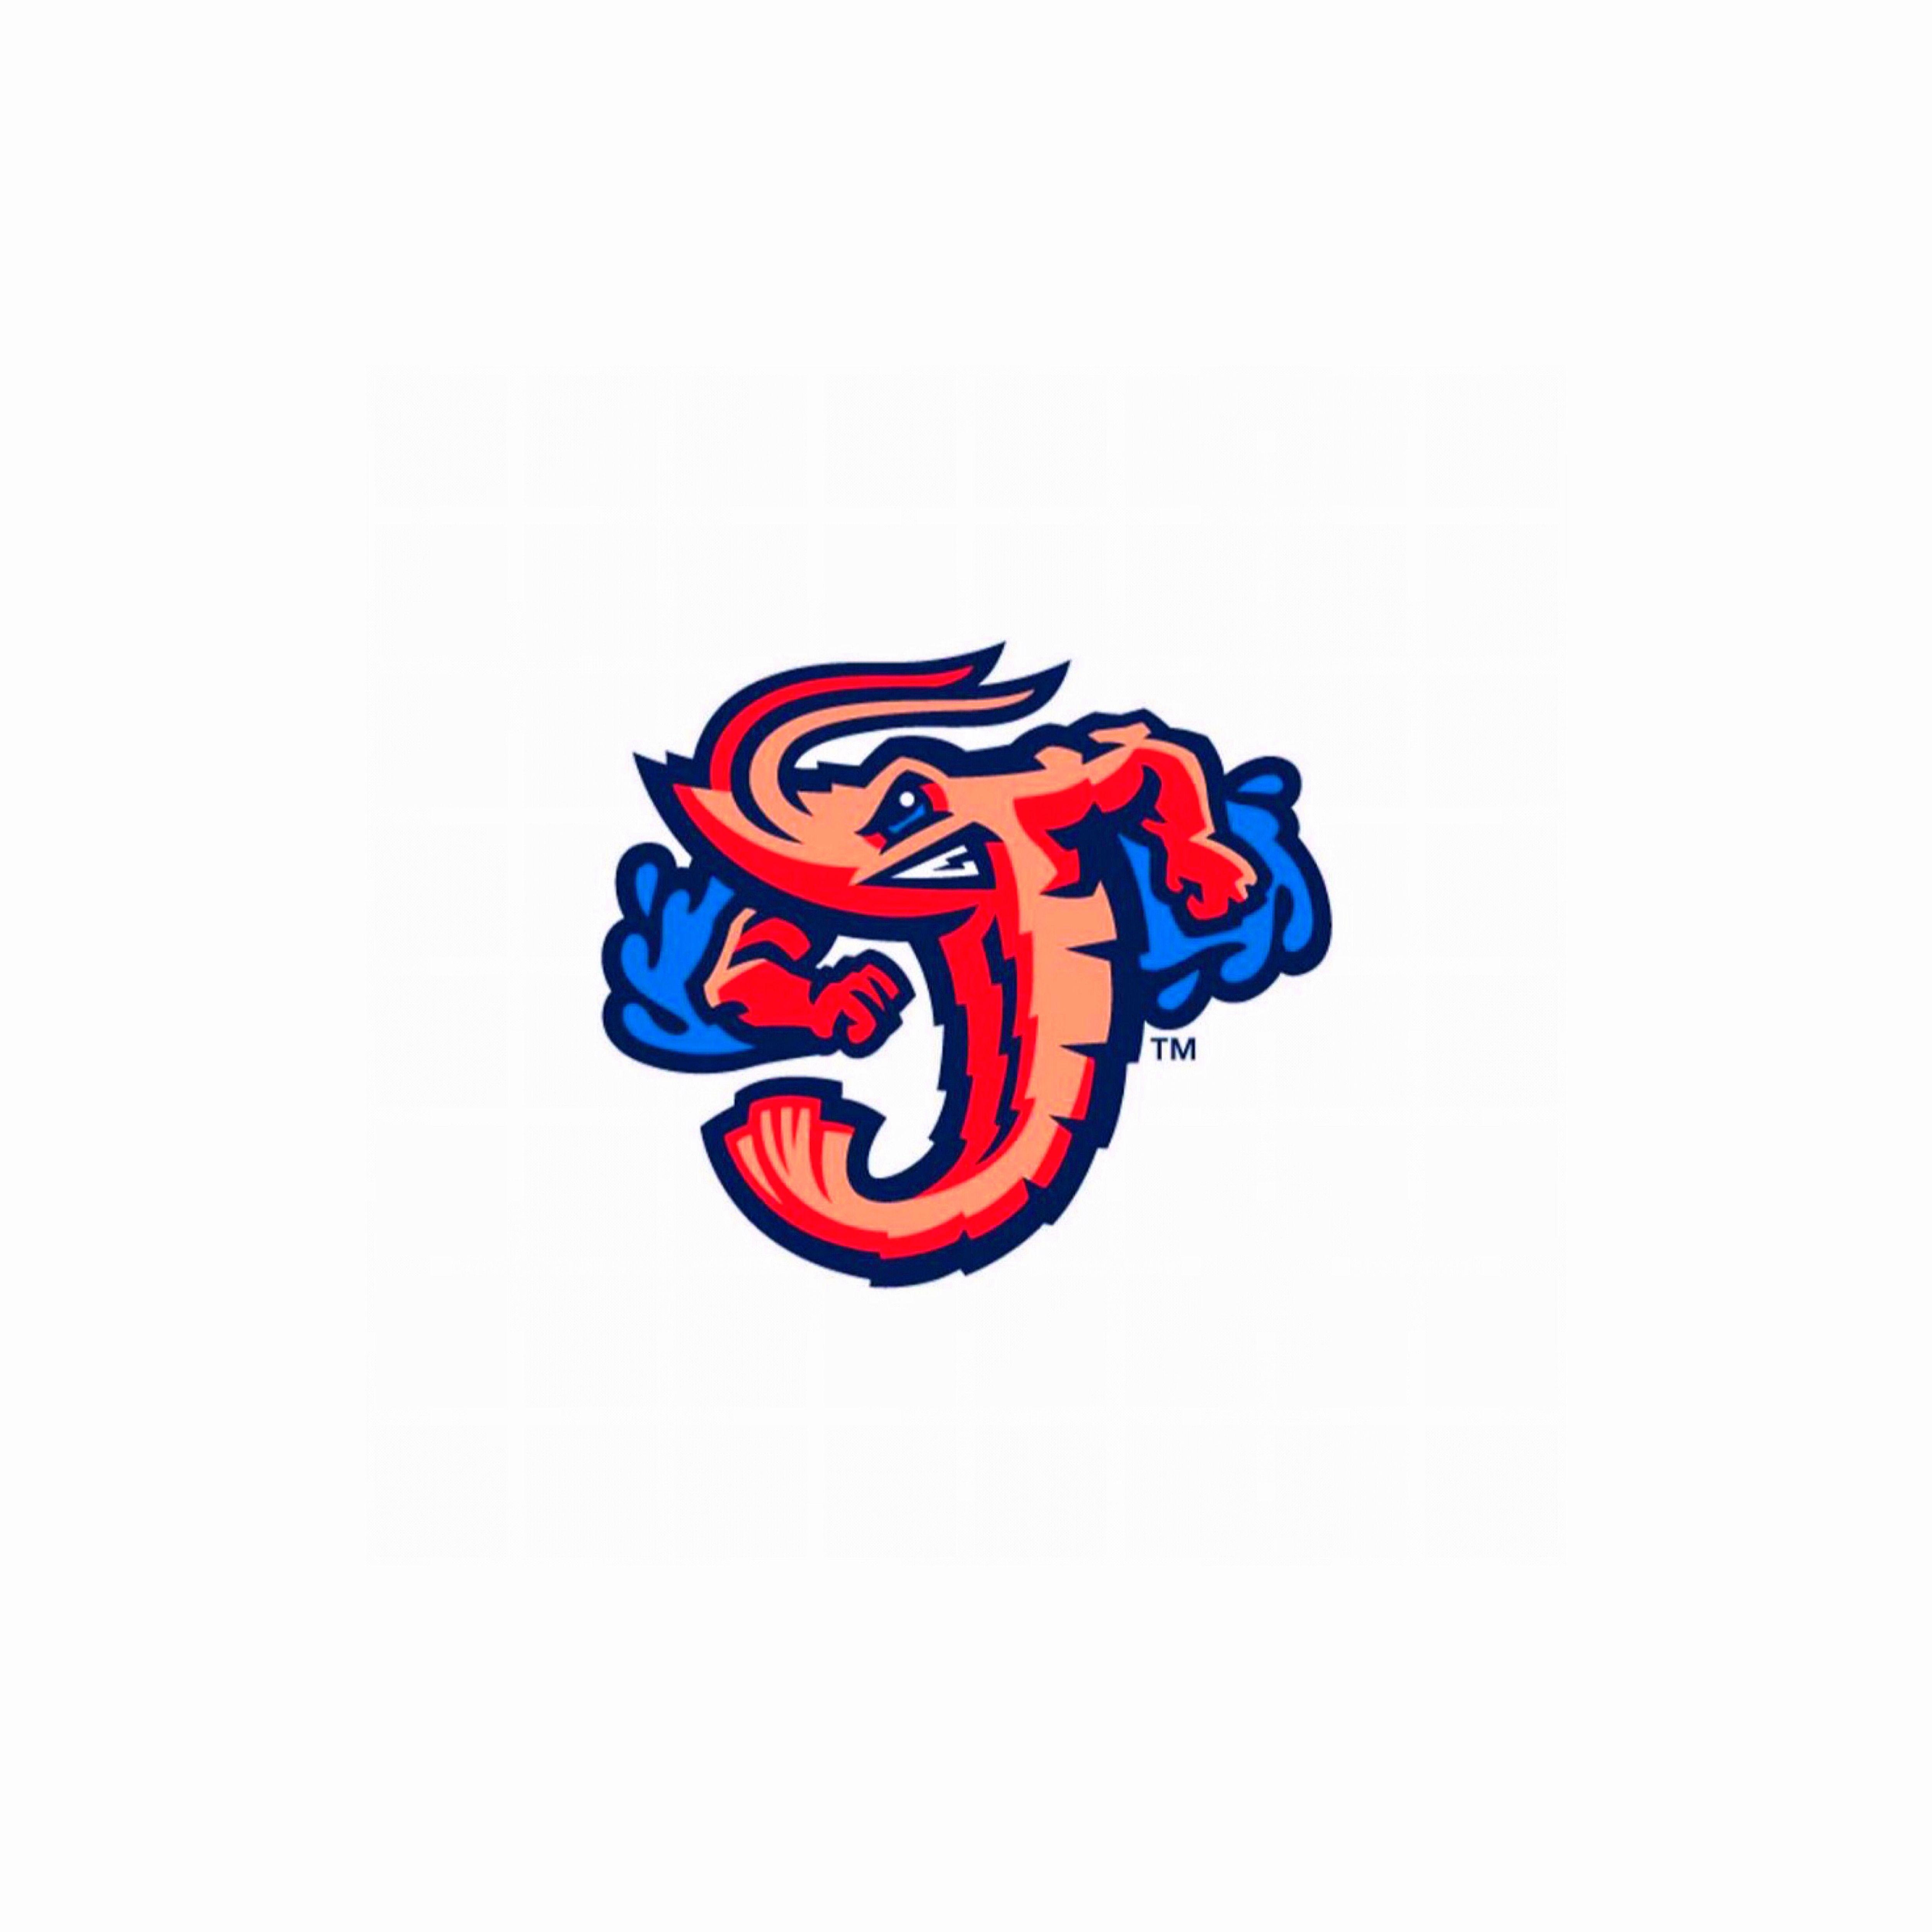 Jacksonville Jumbo Shrimp iPhone wallpaper Sports logo